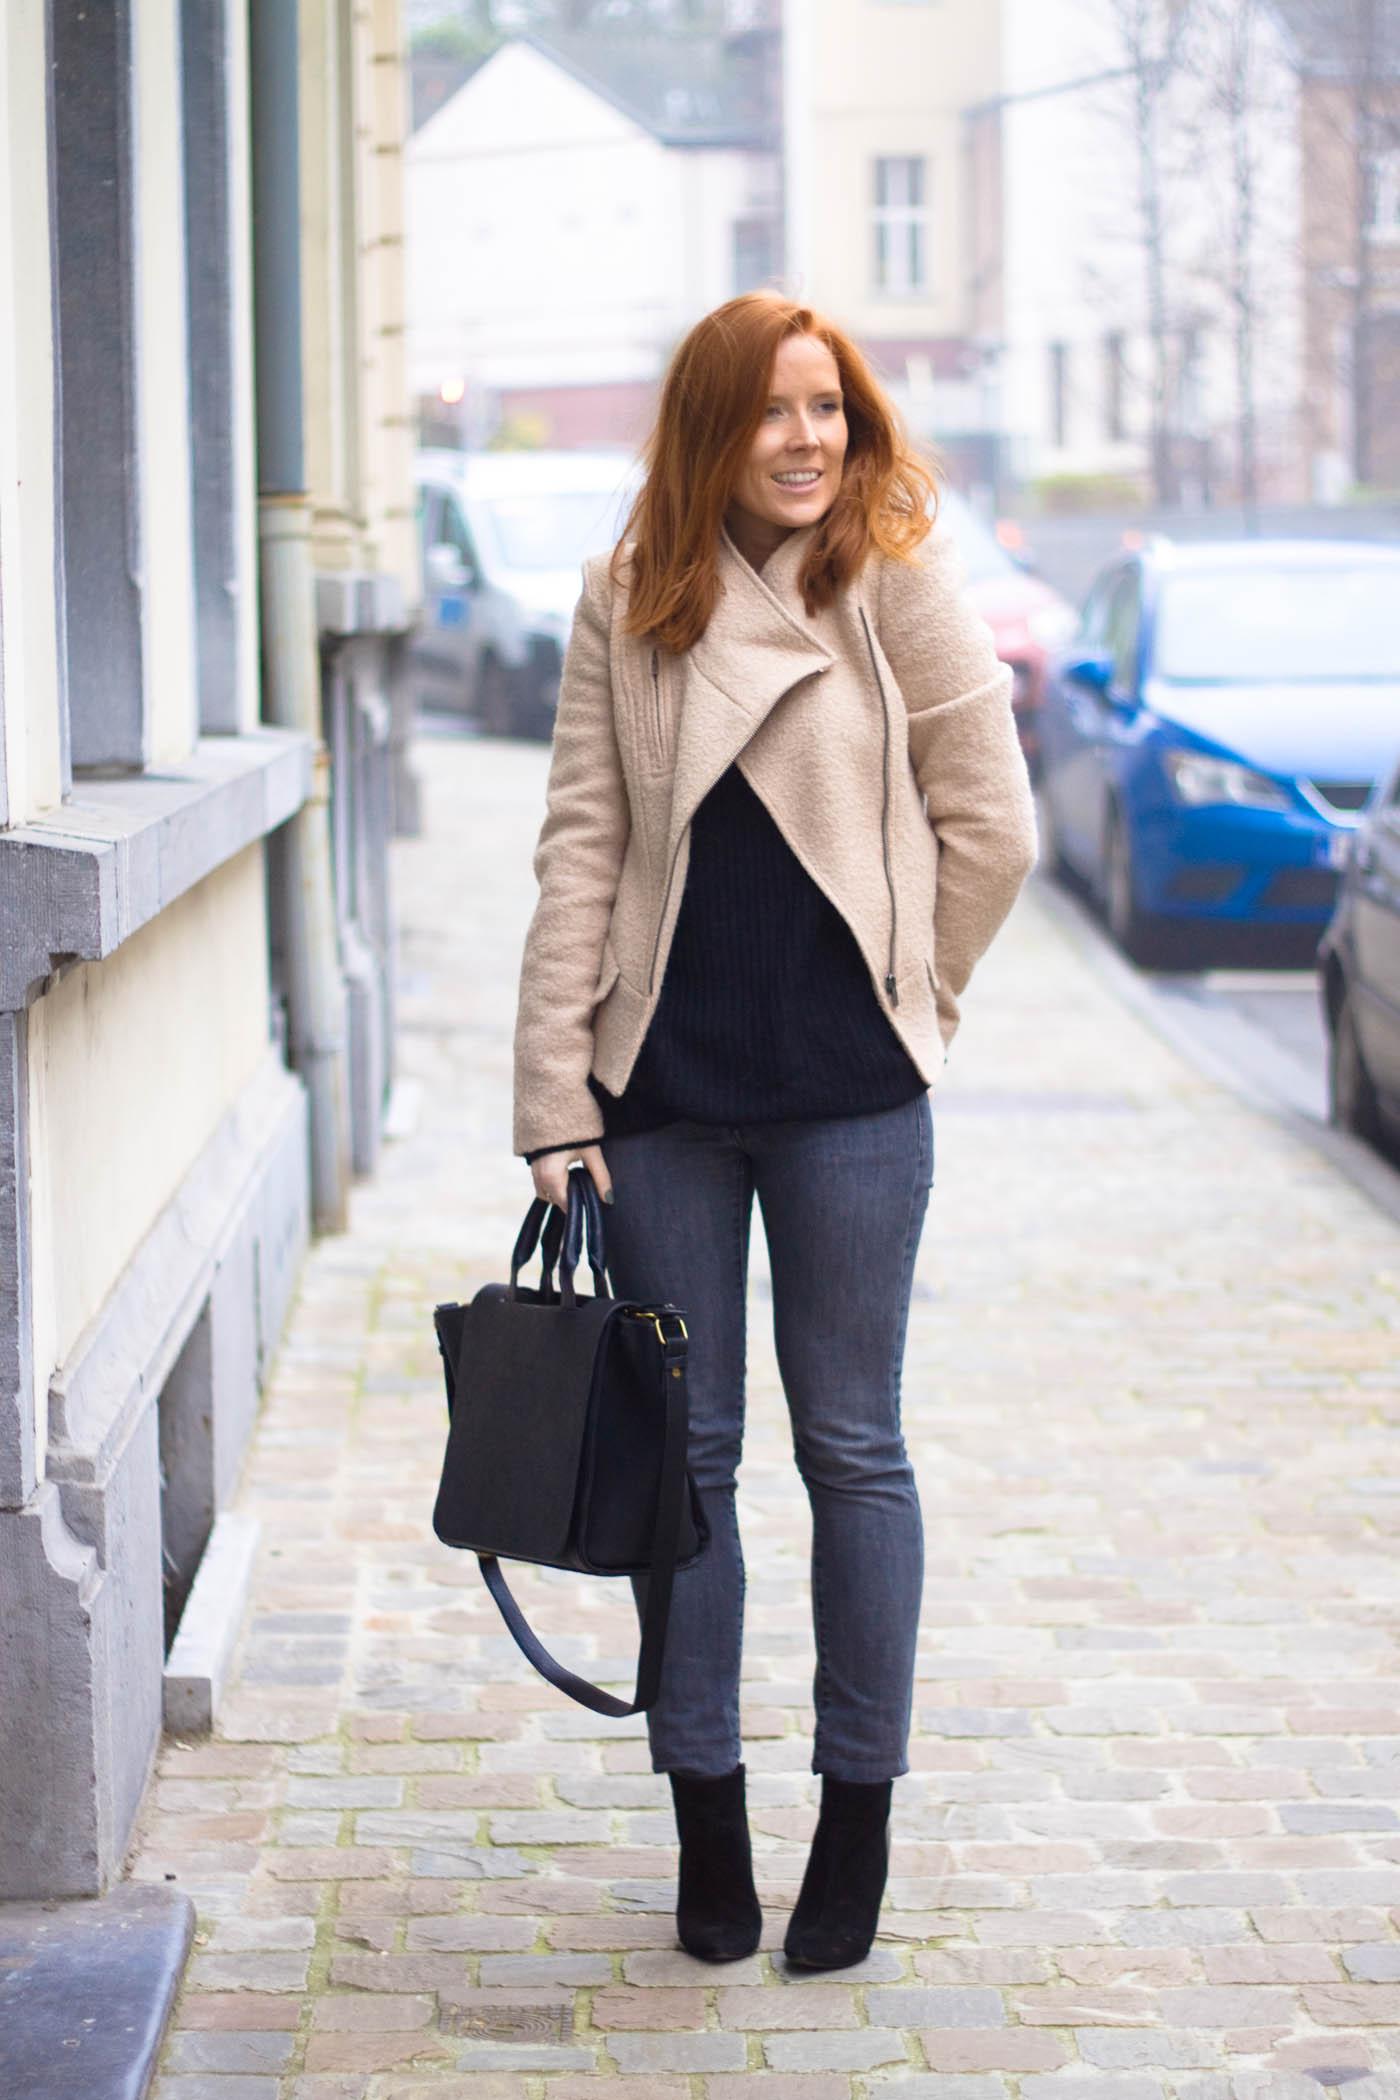 Winter Fashion Look Elegant And Stylish